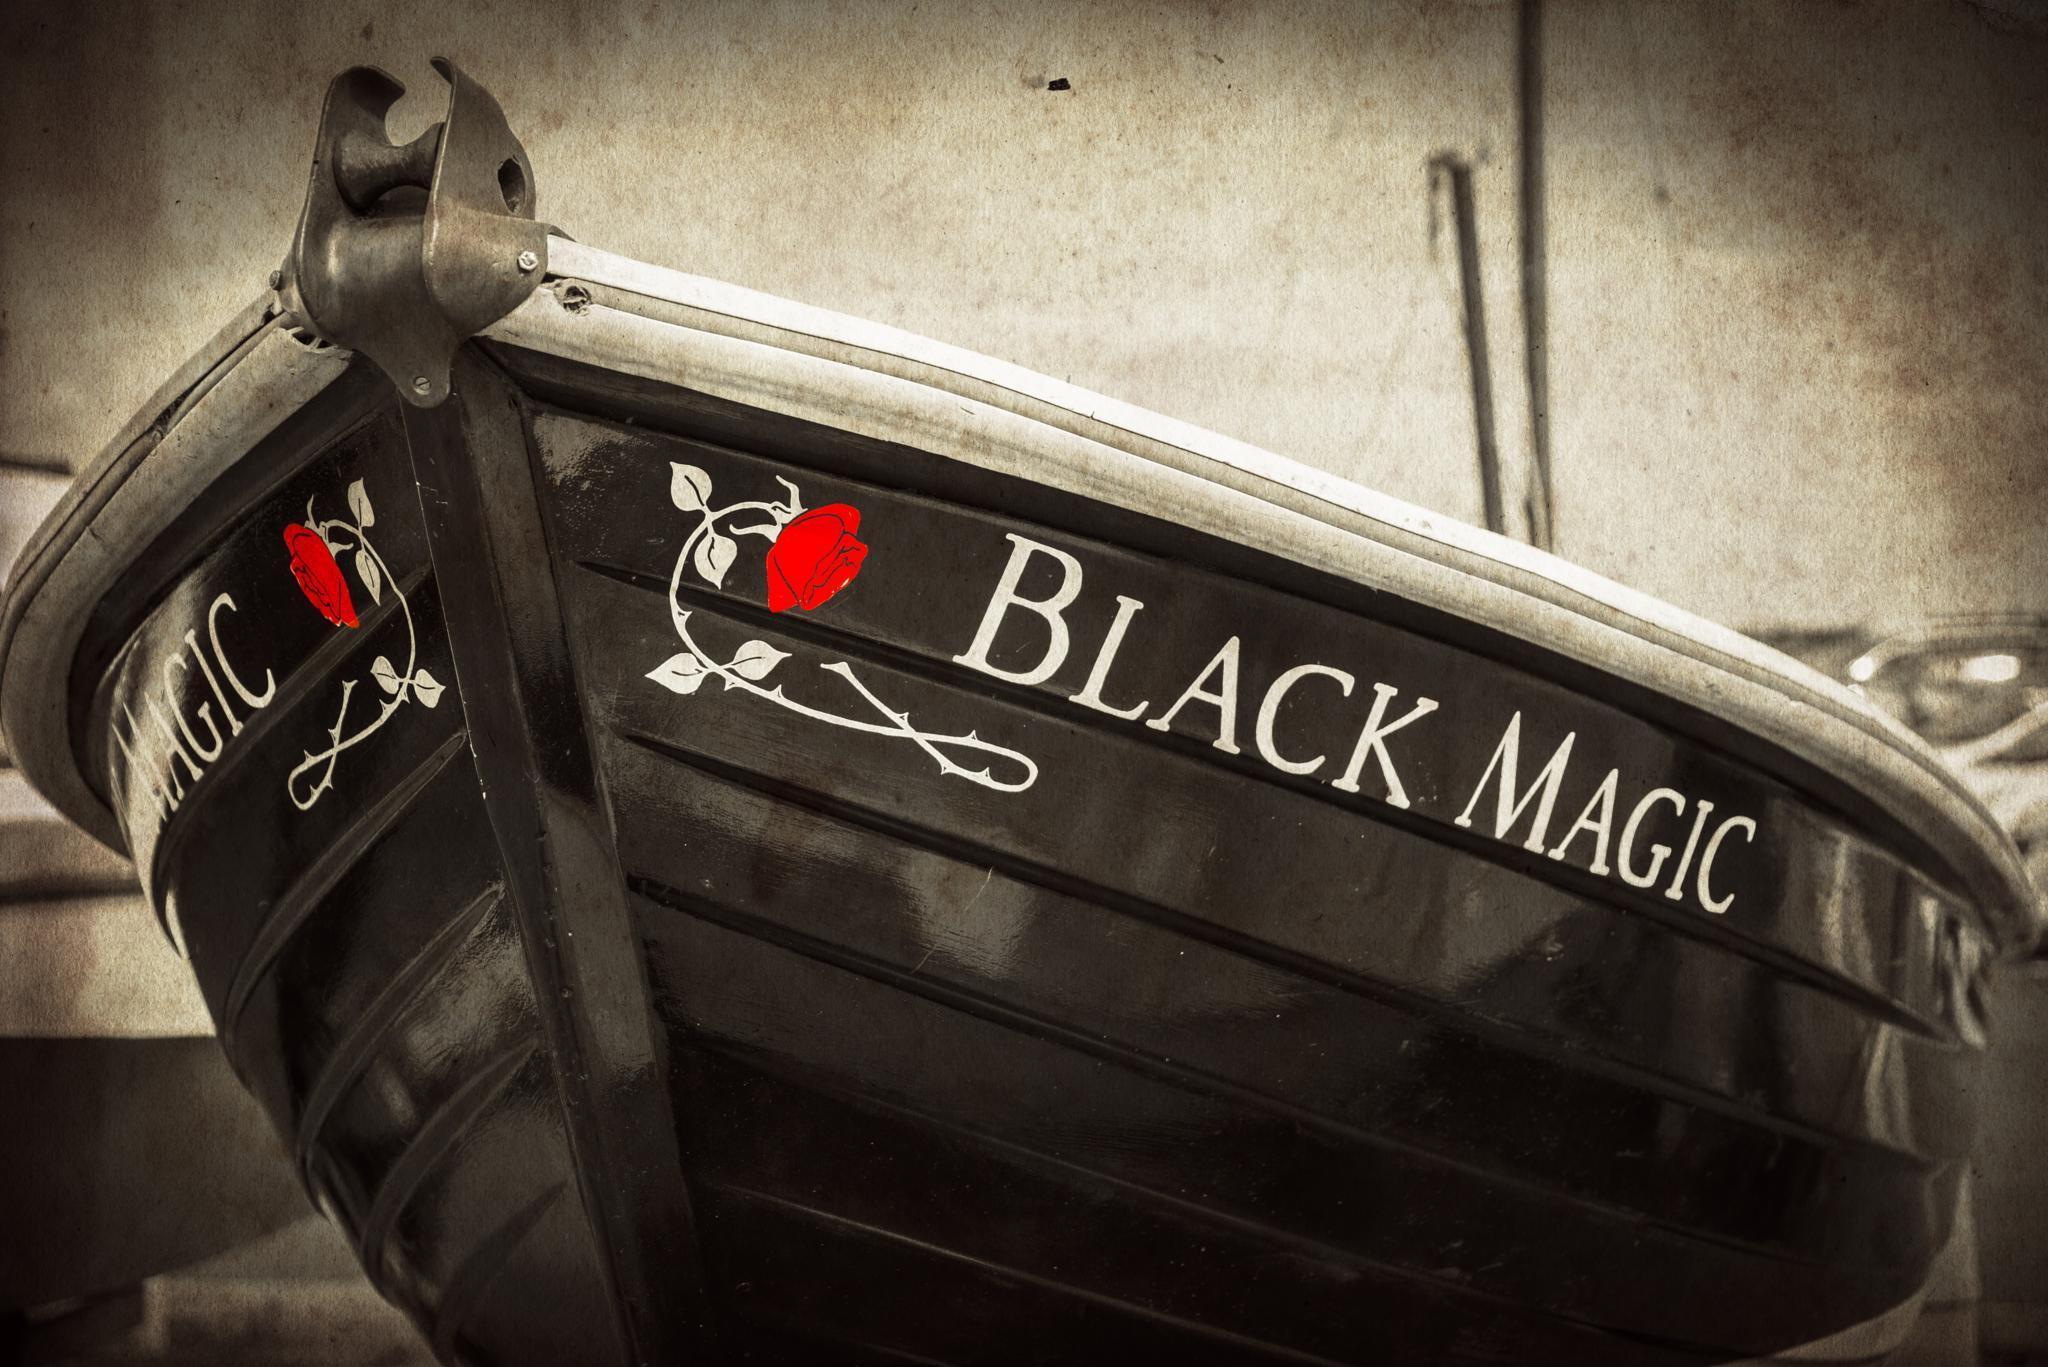 Black Magic by Zoltan Kovacs